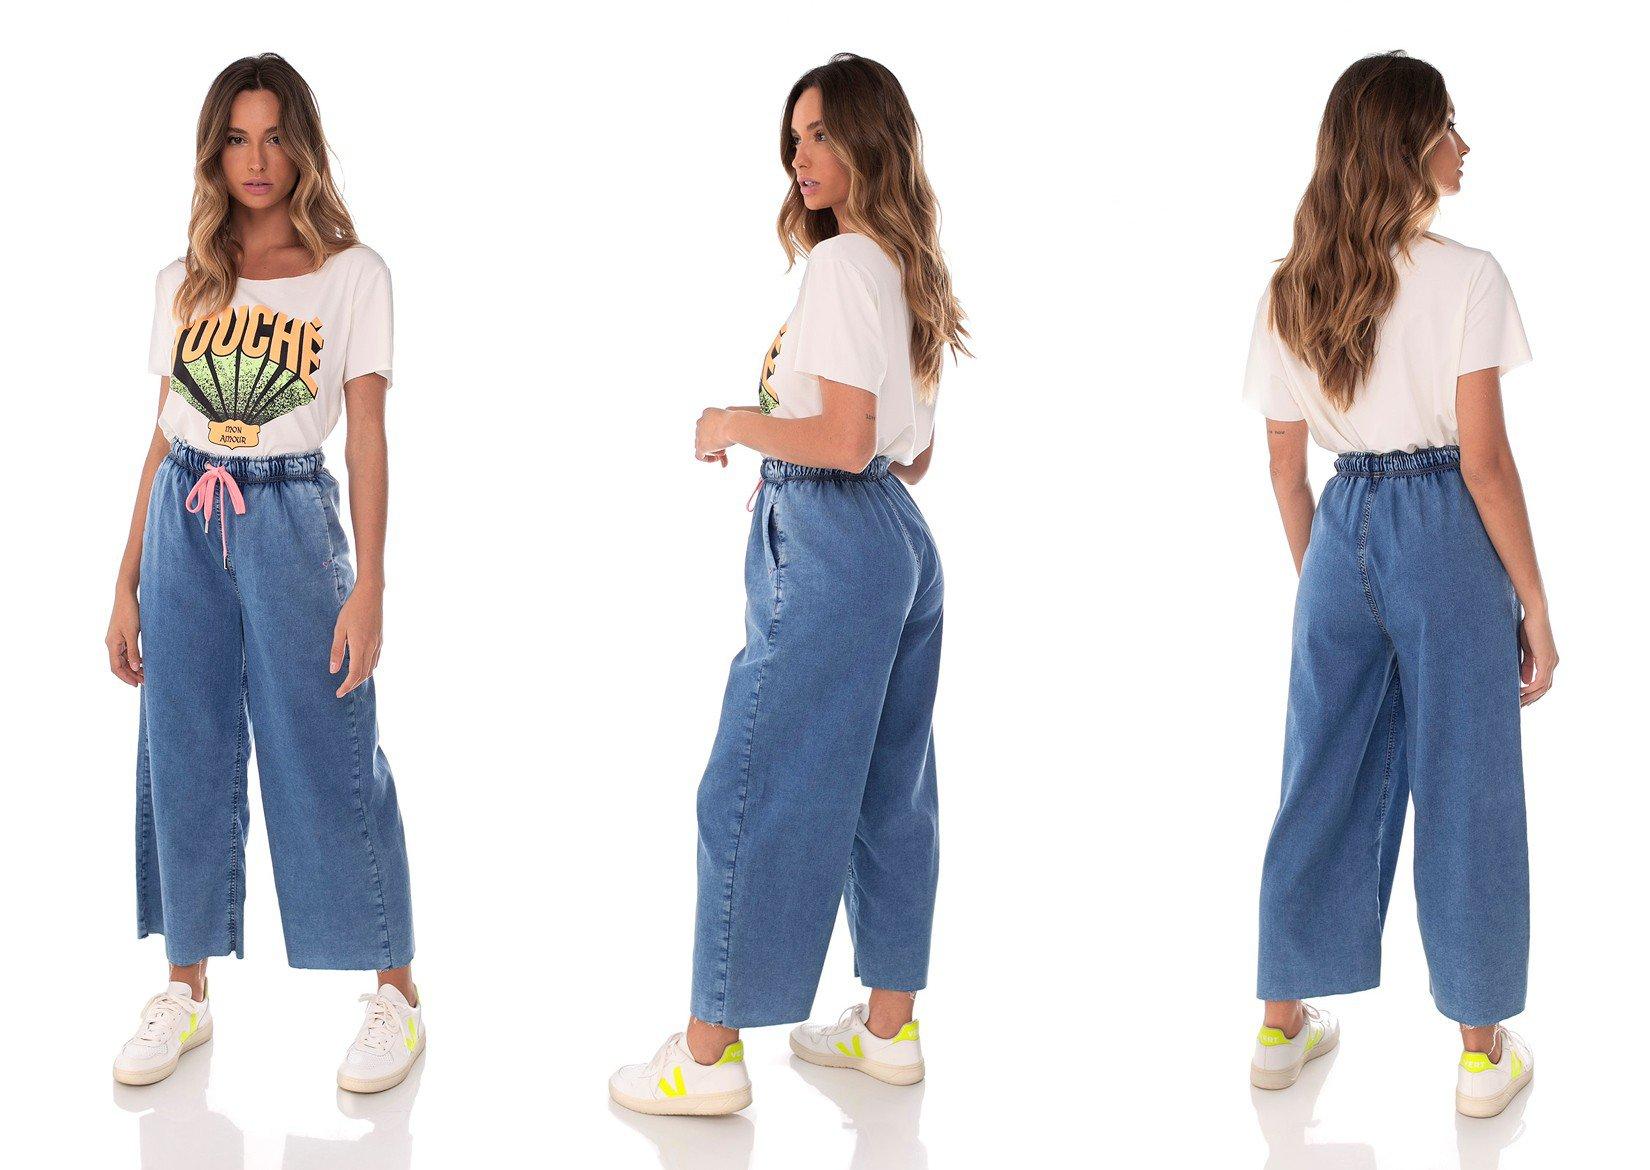 dz3638 com calca jeans feminina pantacourt fit denim zero trio